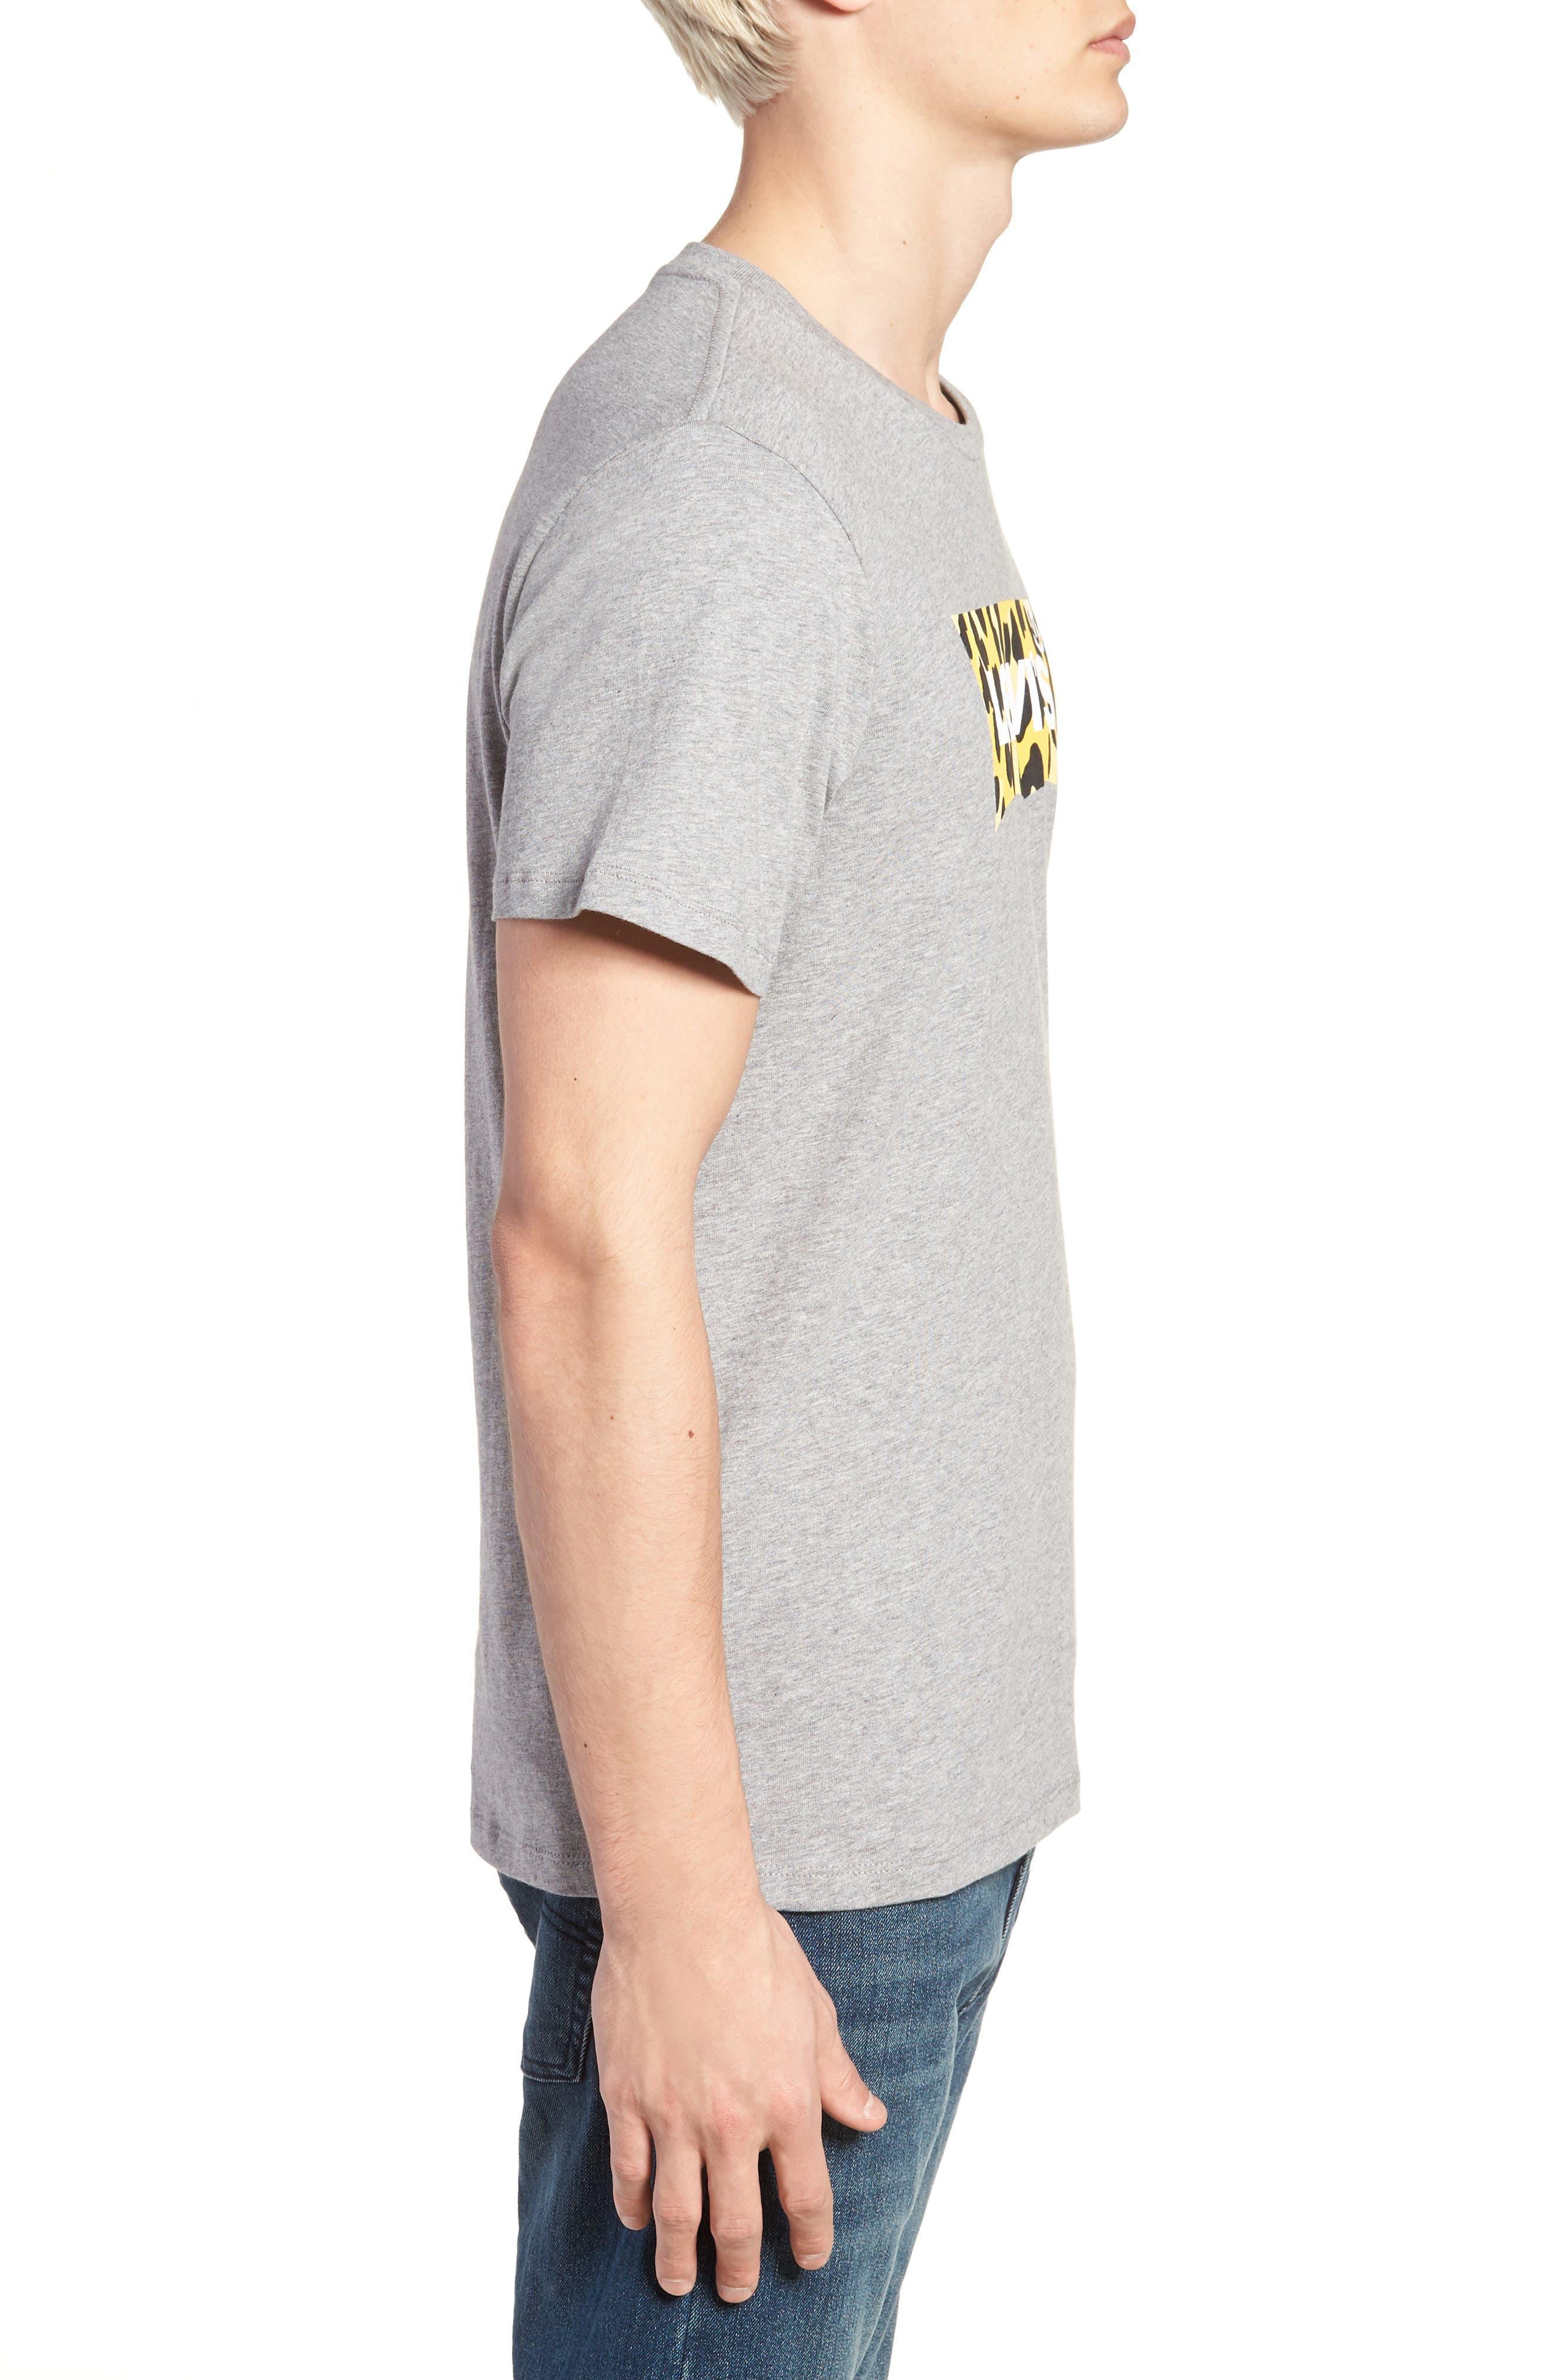 Housemark Graphic T-Shirt,                             Alternate thumbnail 3, color,                             020